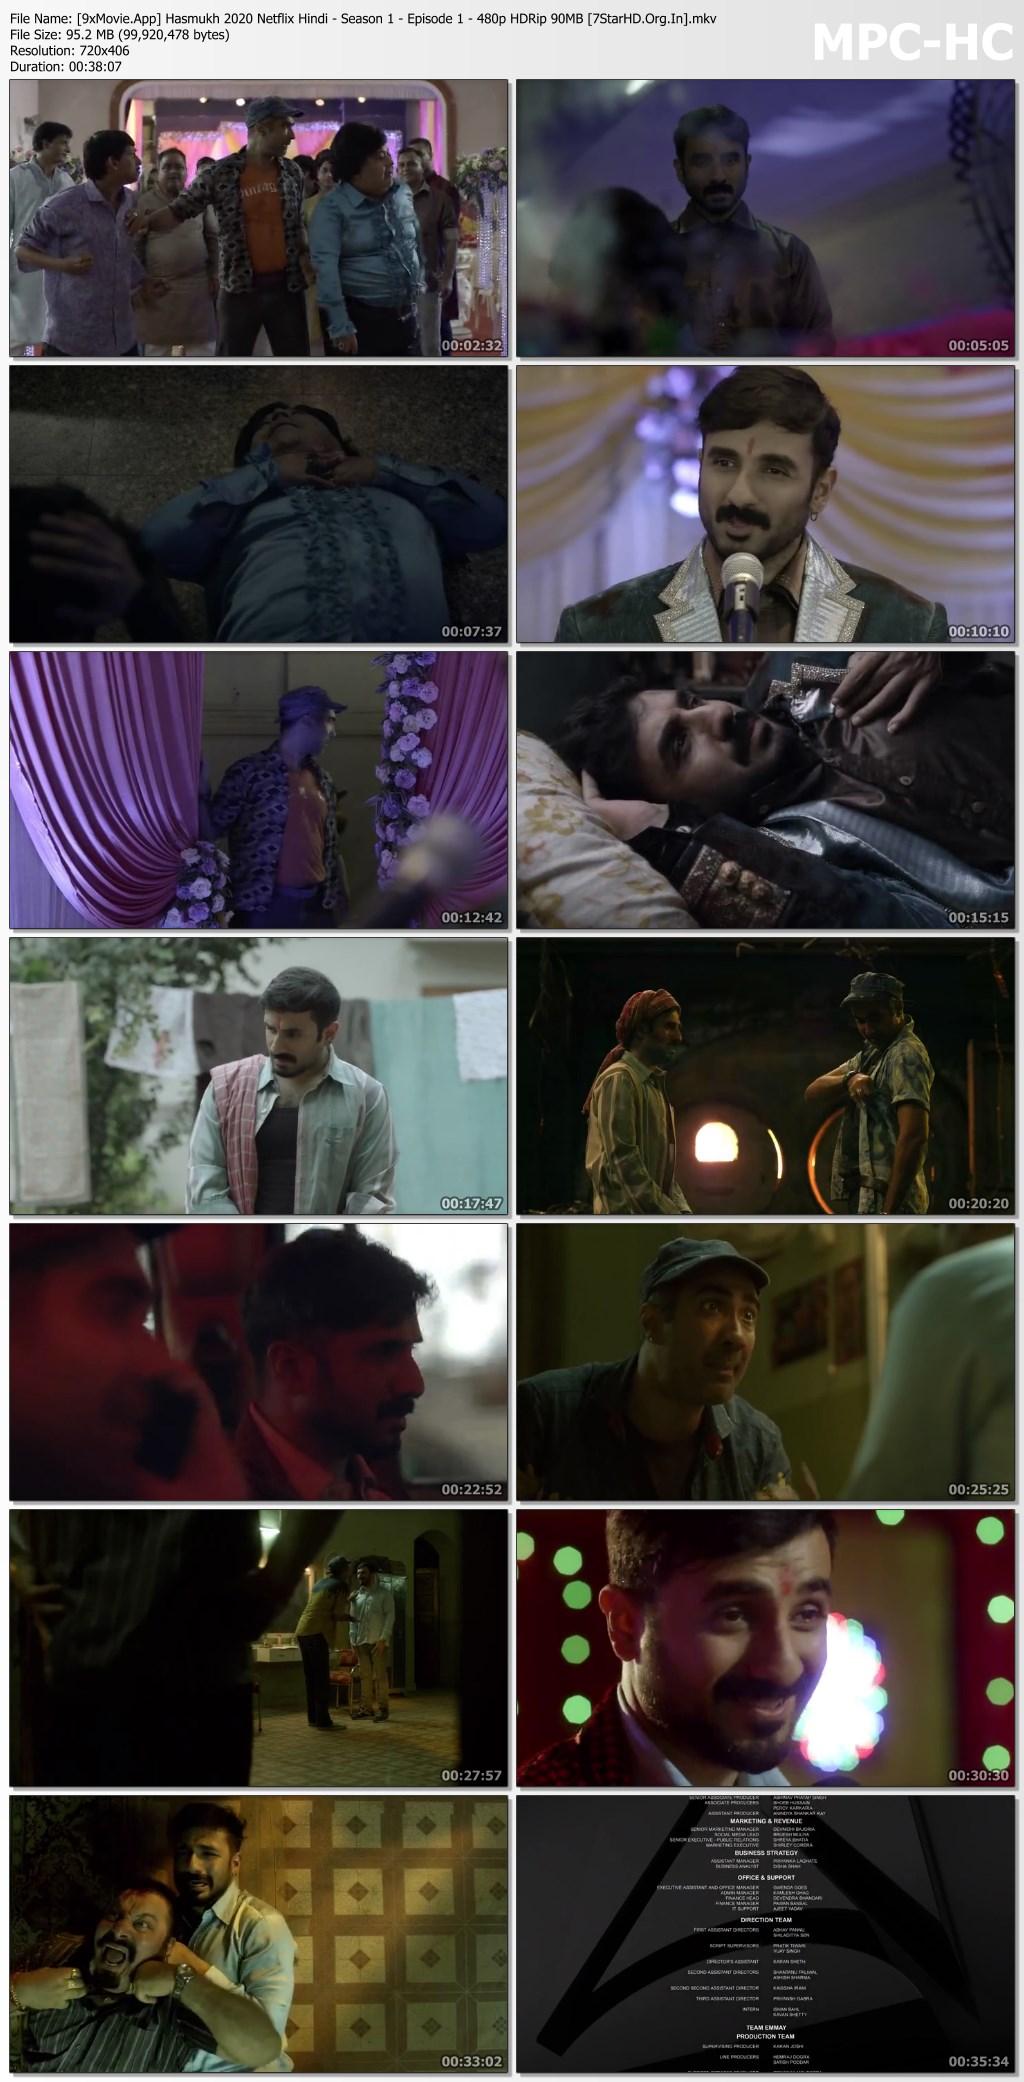 Hasmukh 2020 Netflix Hindi S01 Web Series 480p HDRip x264 800MB